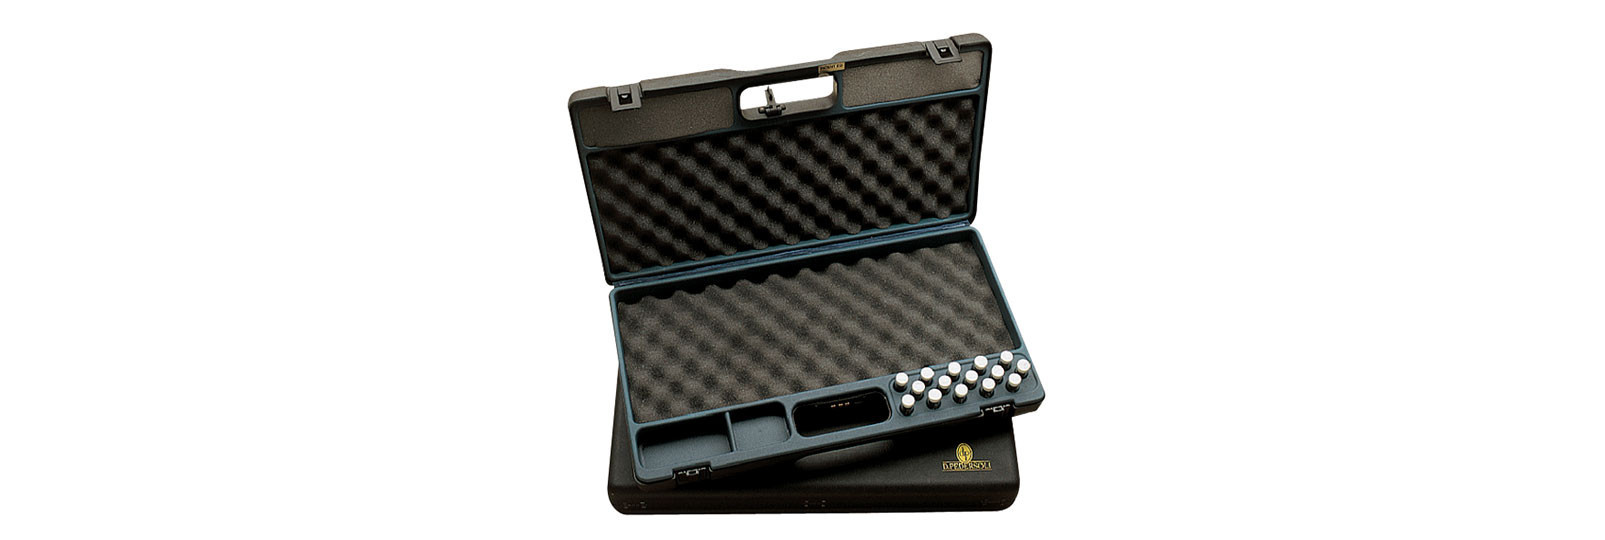 Super match pistol case